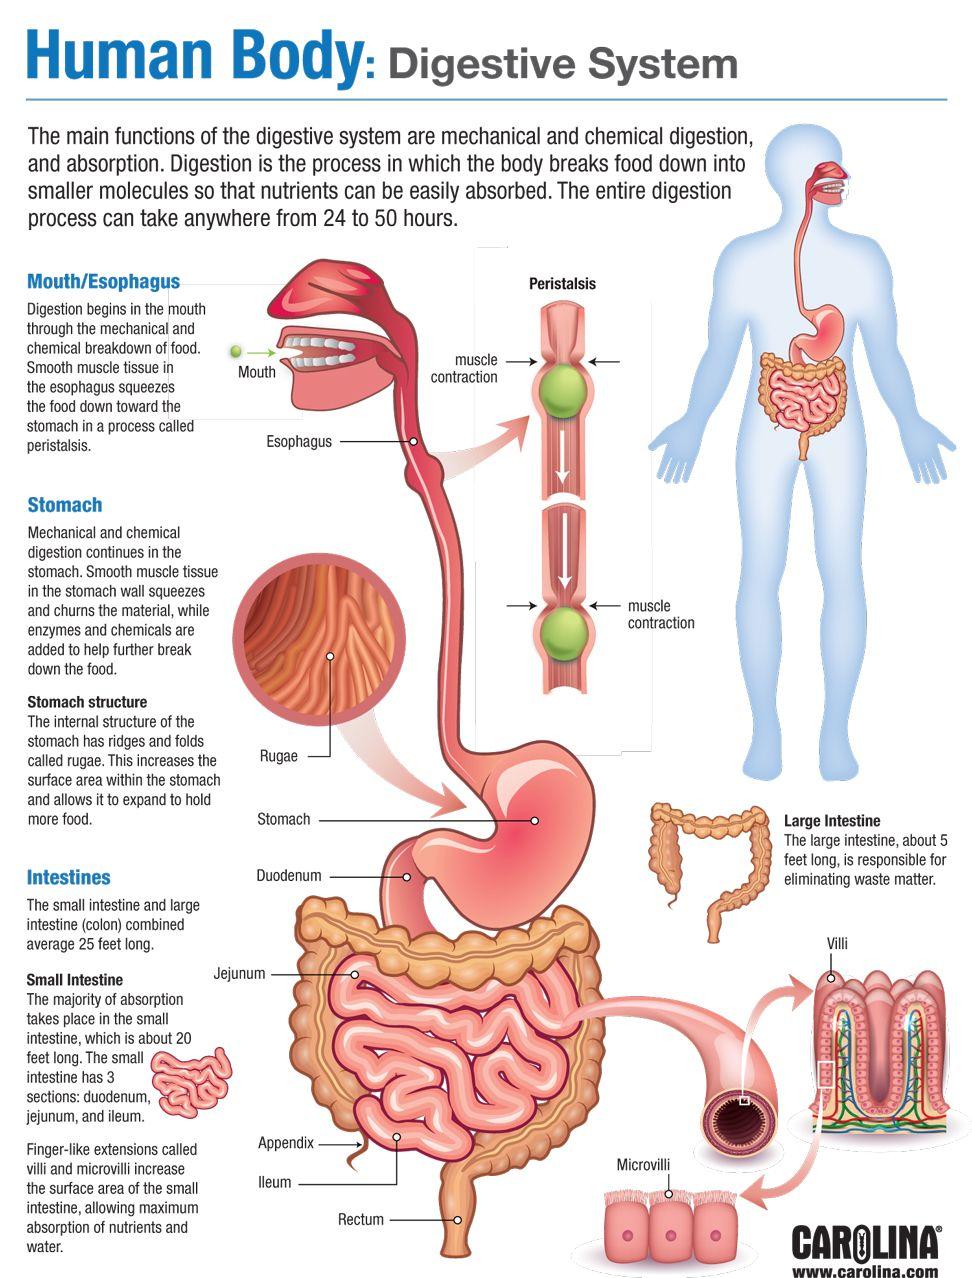 Human Body: Digestive System | Human Anatomy Quiz - Quizizz